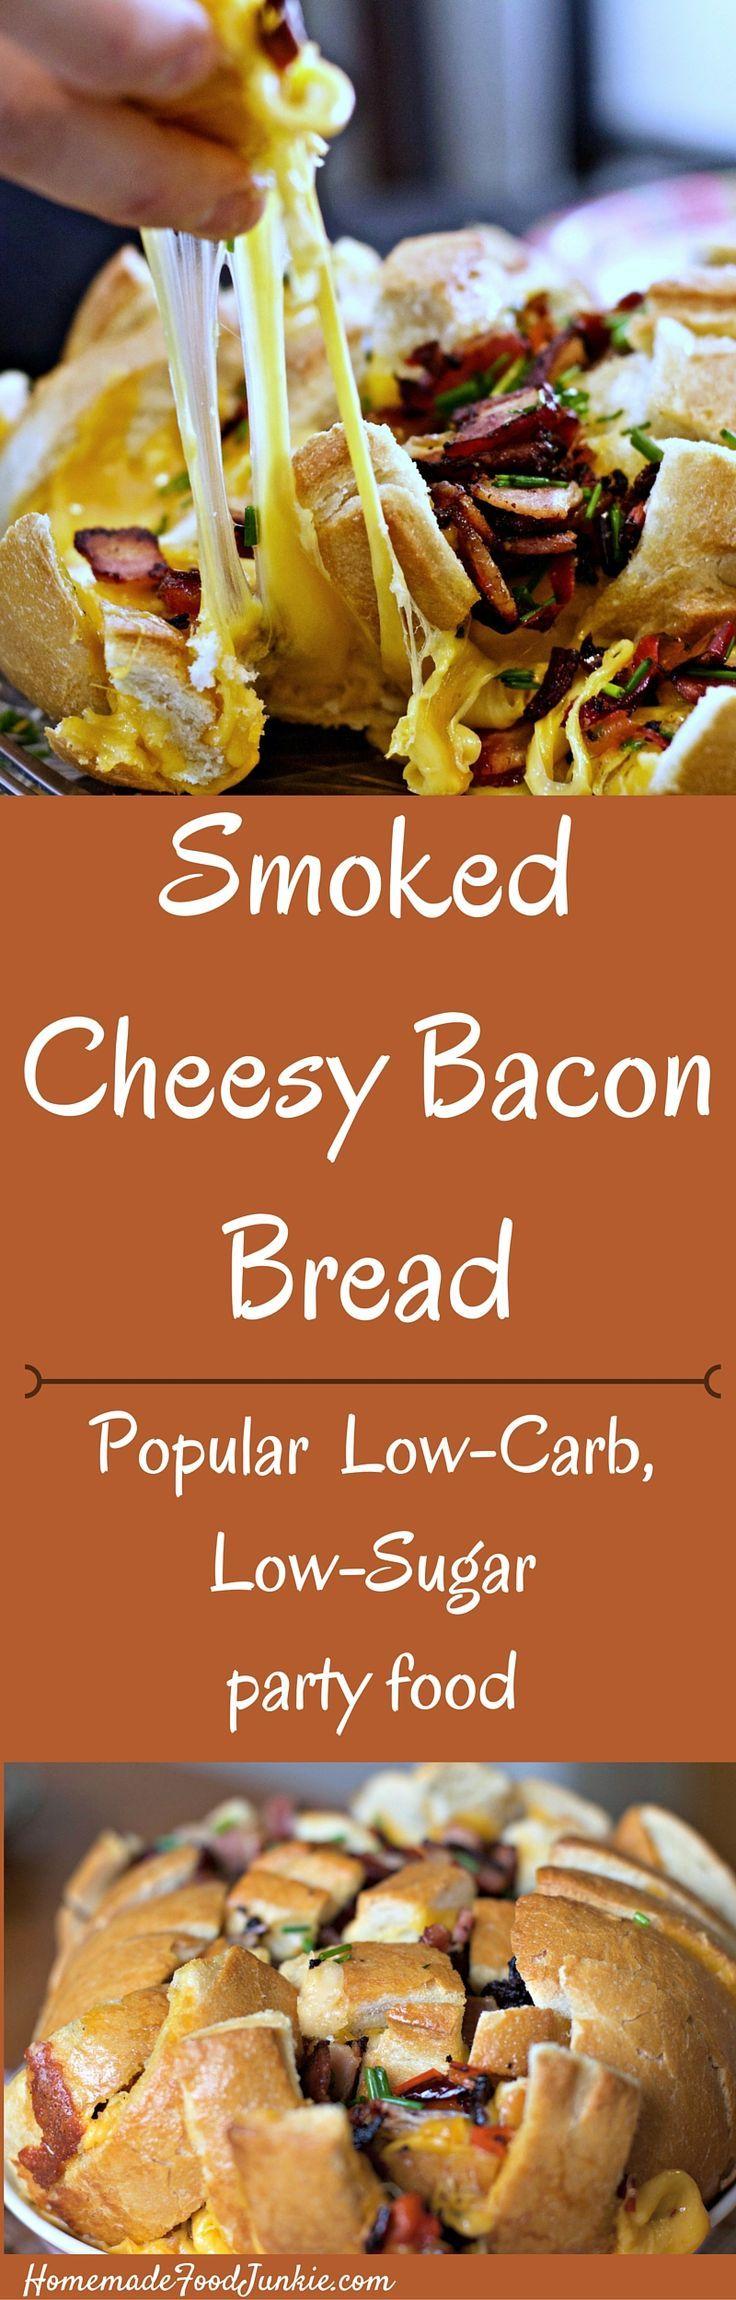 ... Recipes ) on Pinterest | Avocado dip, Artichokes and Stuffed mushrooms